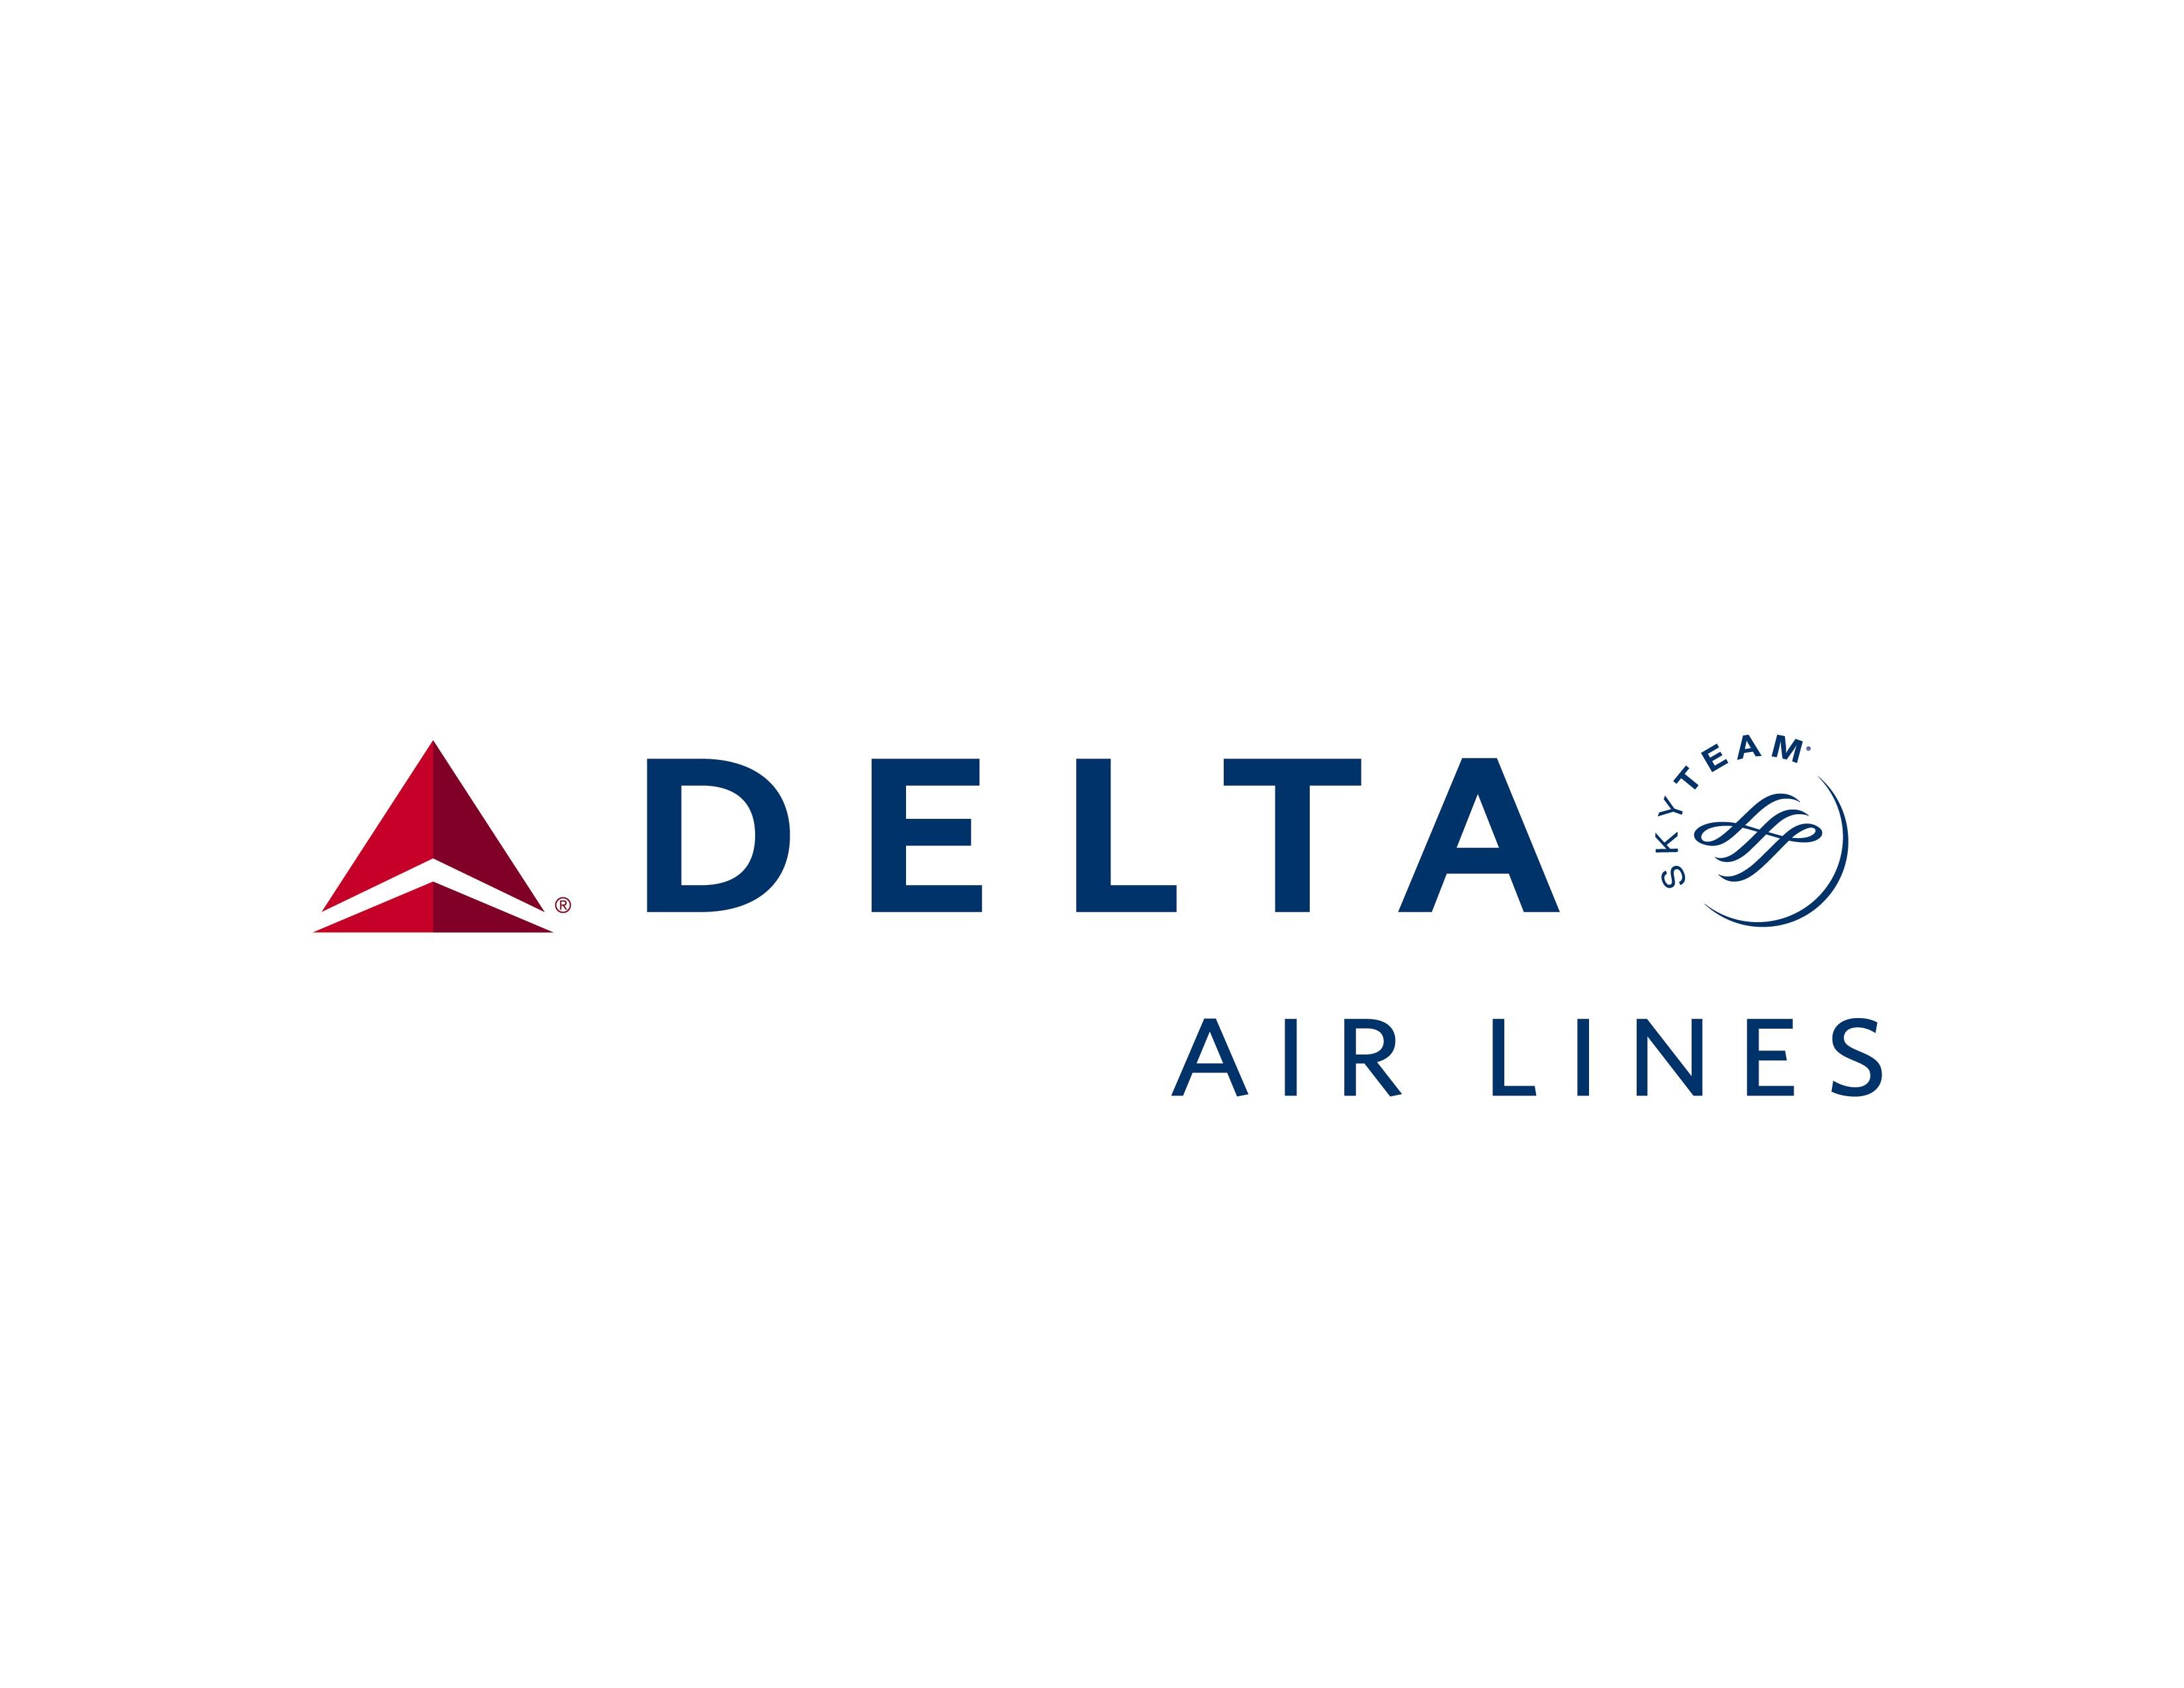 Delta Airlines Logo 2017 - more info